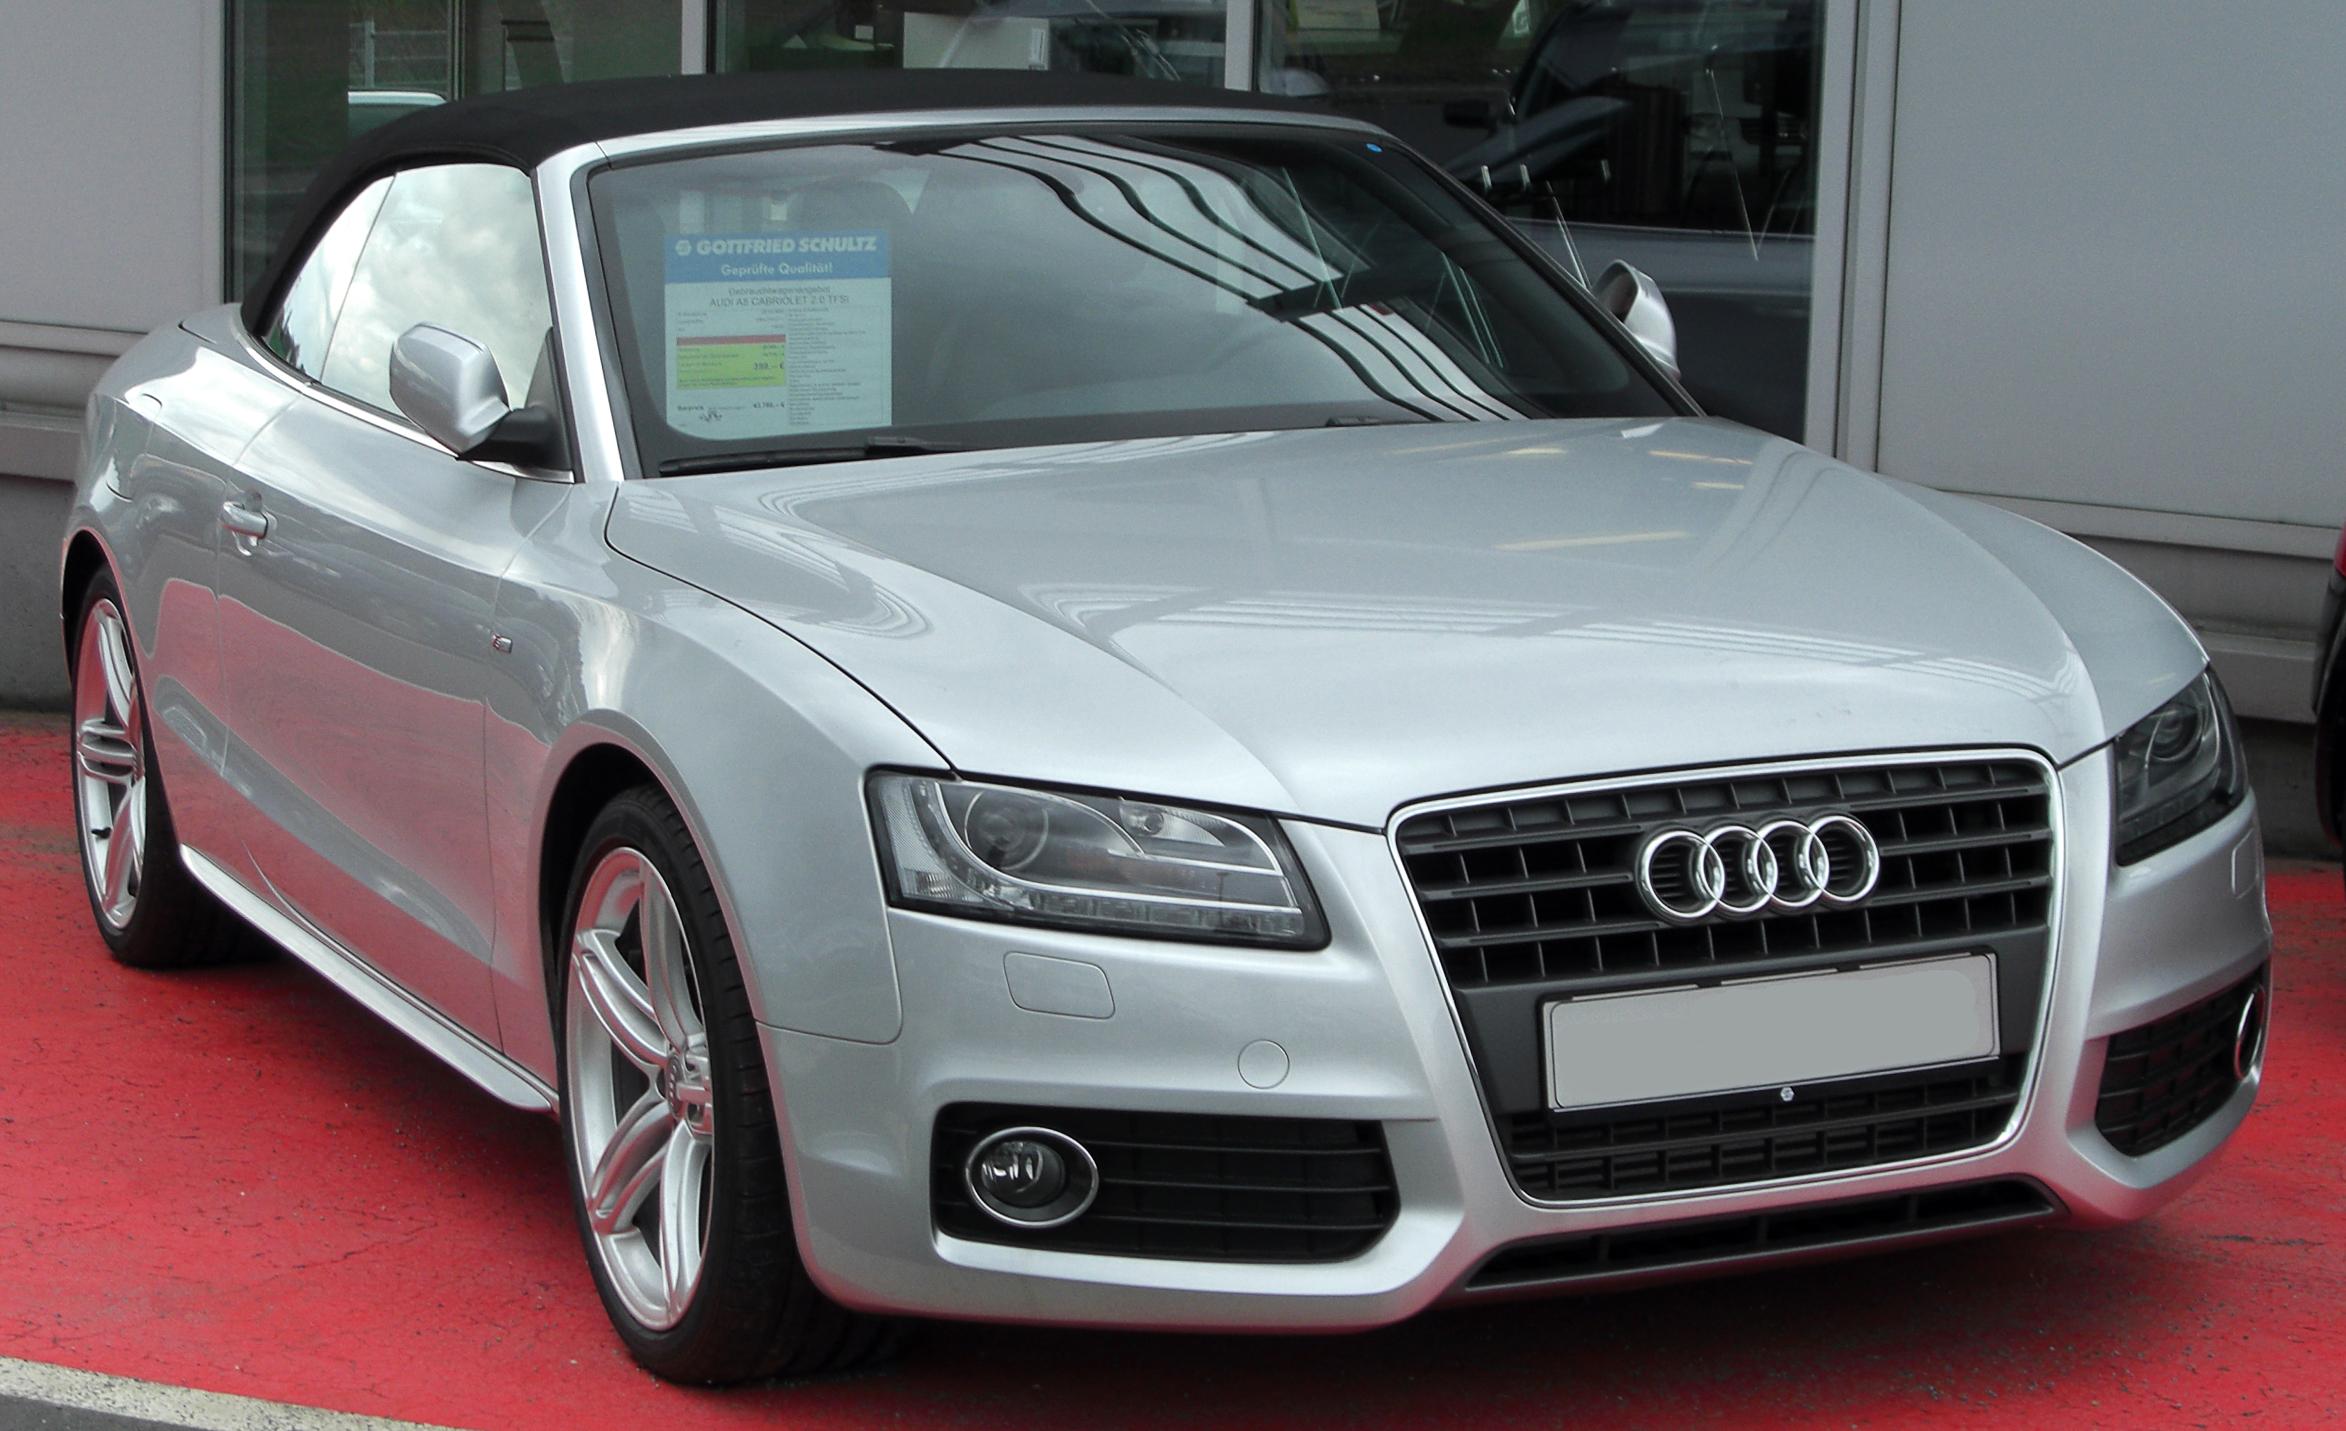 File Audi A5 Cabriolet 2 0 Tfsi Front 20100328 Jpg